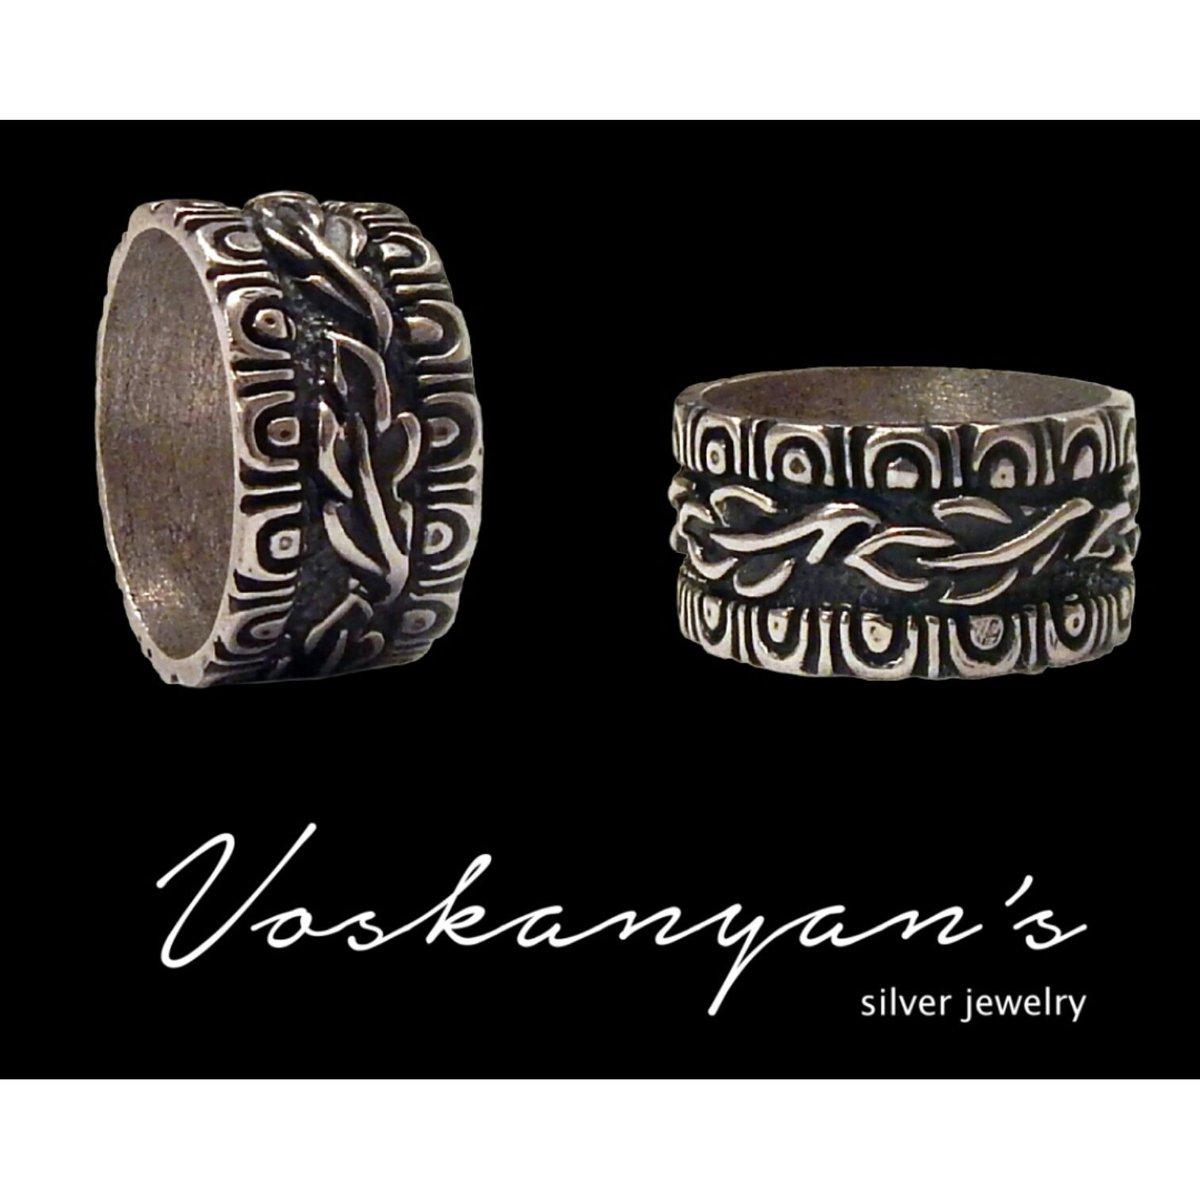 ring #Thalassa - GARNI #pagan collection On #GarniTemple mosaic is written #Ocean &amp; Thalassa (#Sea) - Mother of #Aphrodite #Voskanyans<br>http://pic.twitter.com/sXURtttobK